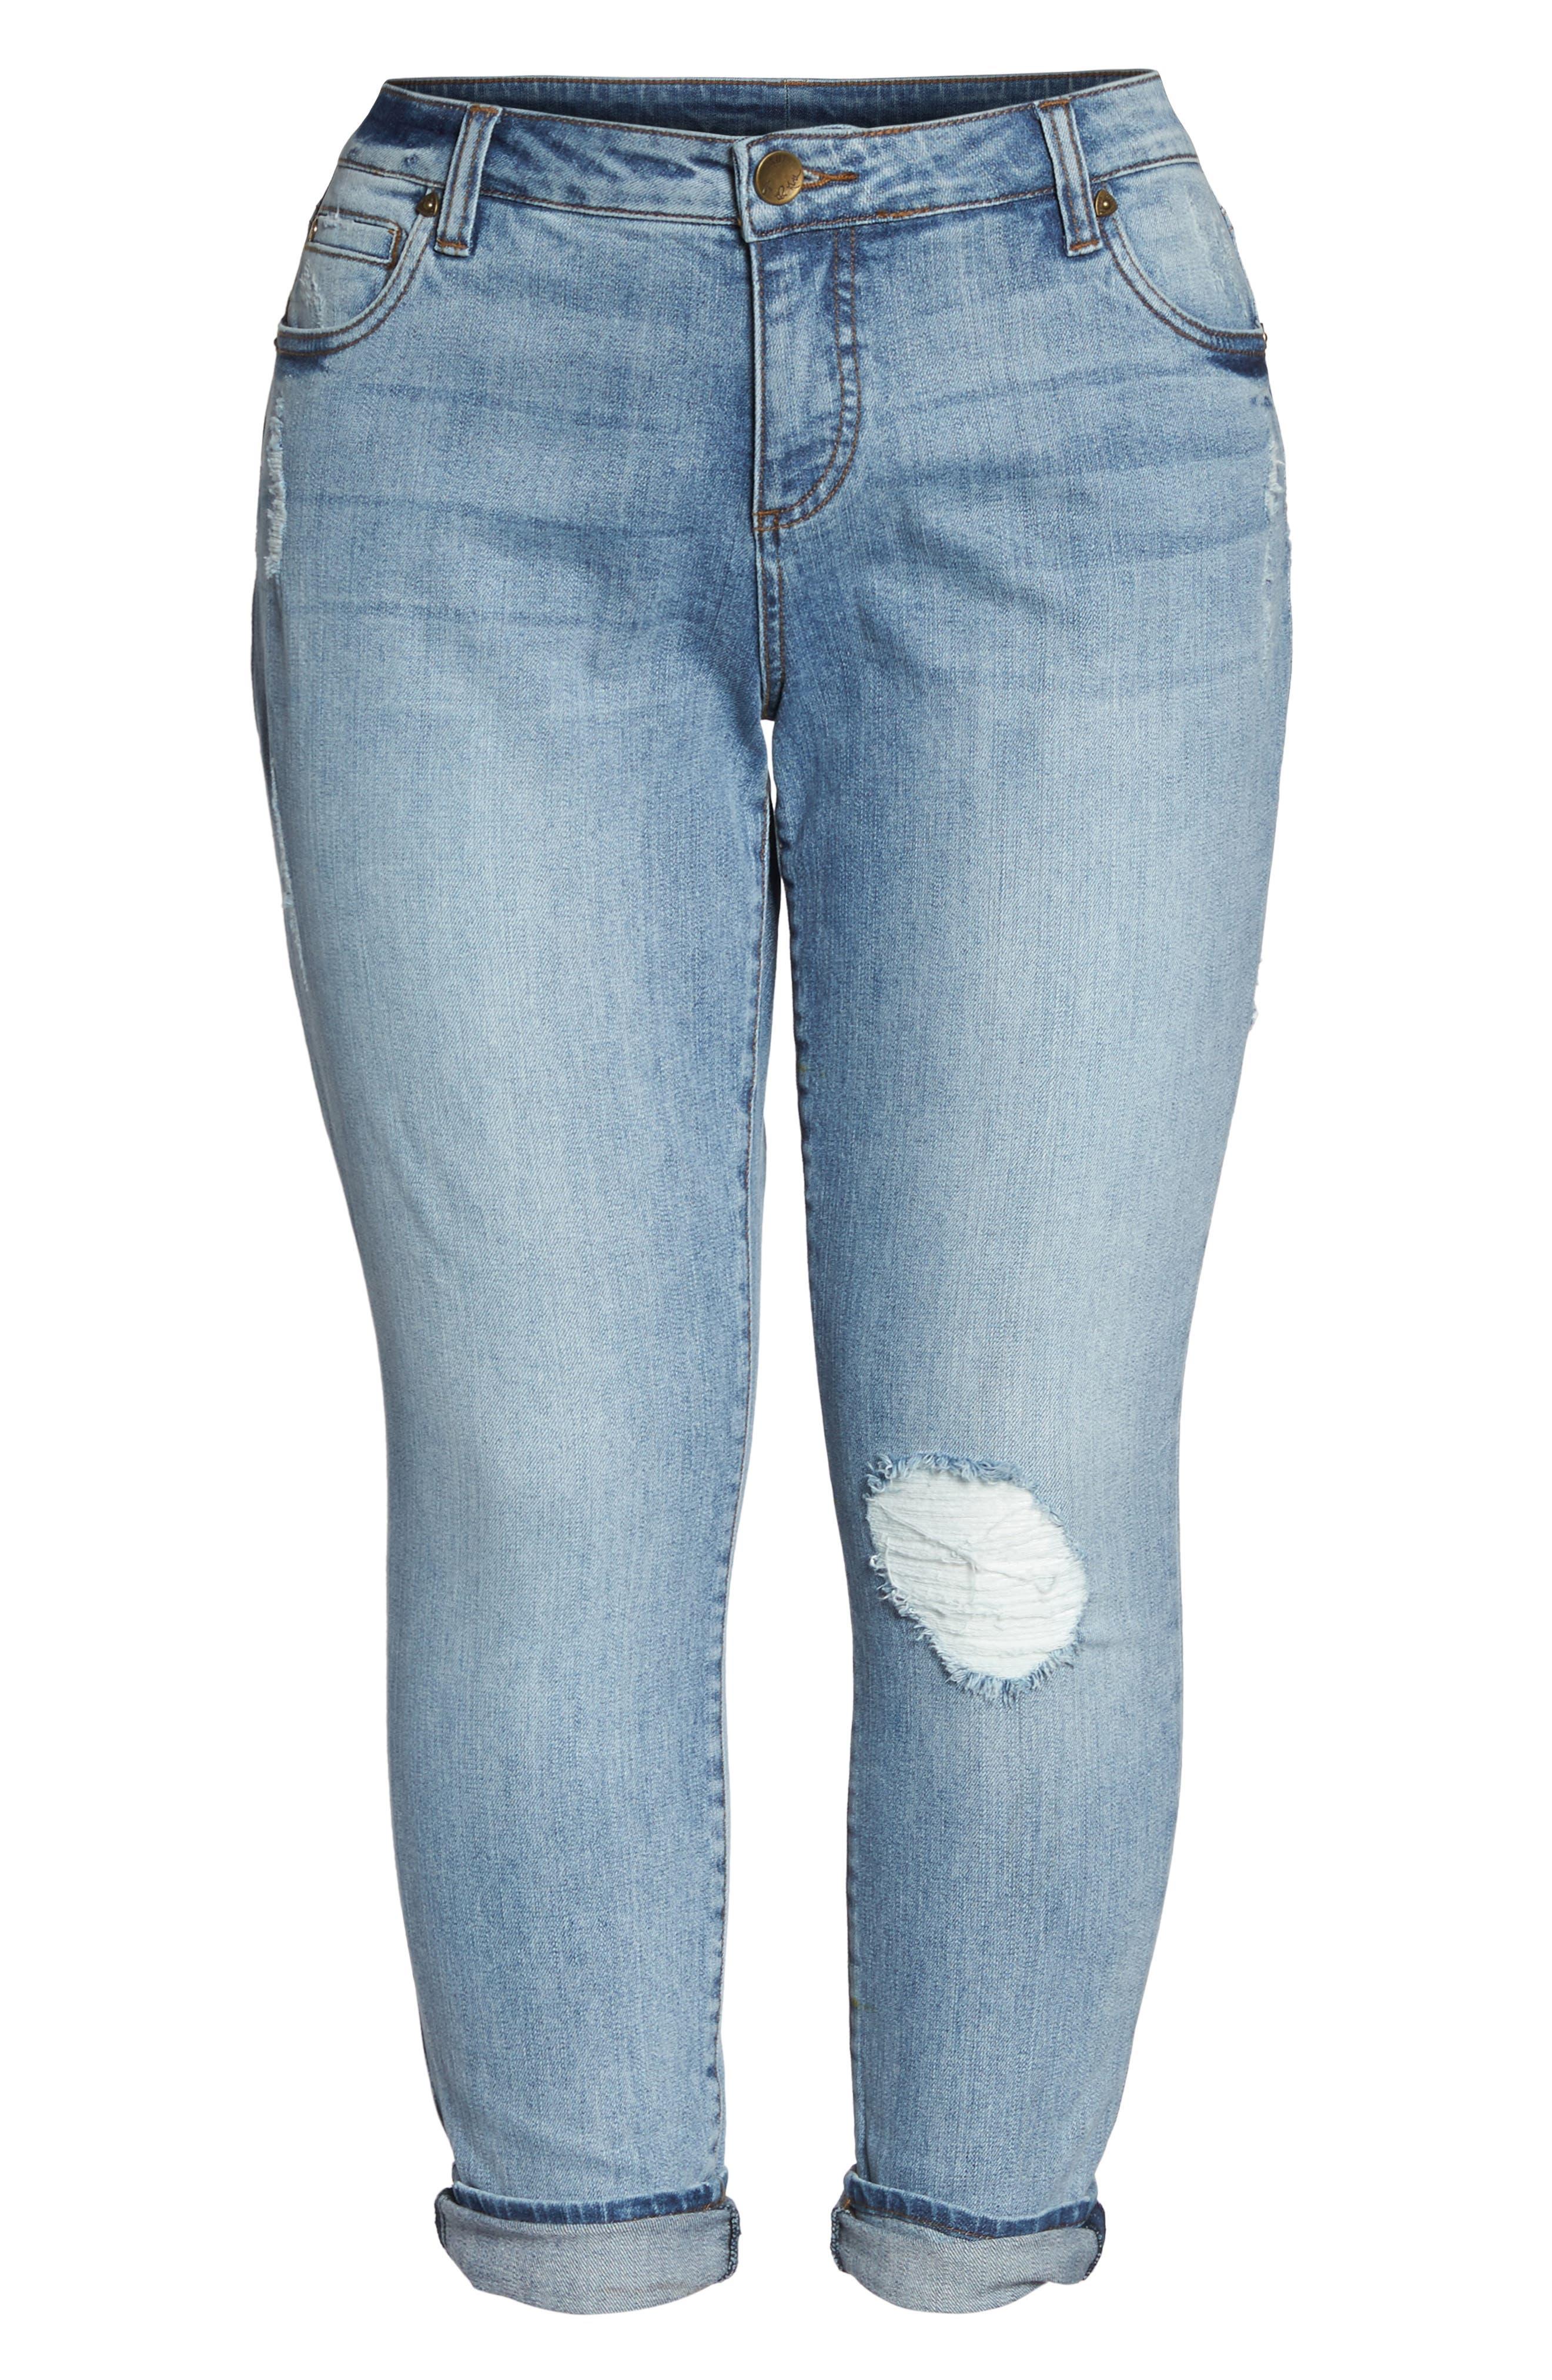 Catherine Distressed Boyfriend Jeans,                             Alternate thumbnail 6, color,                             Announce